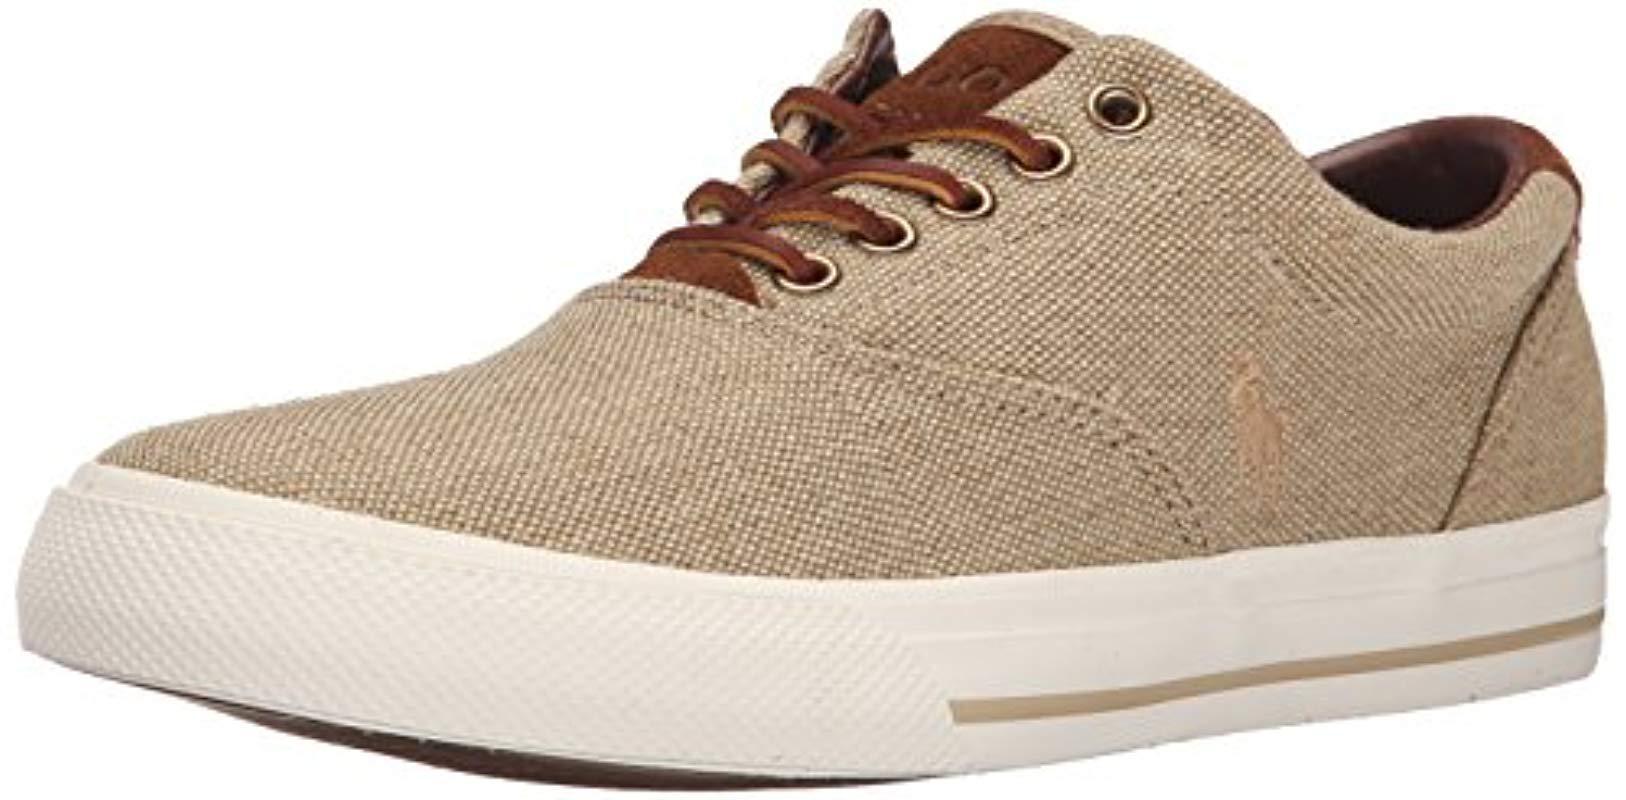 For Men Polo Lauren Vaughn Lyst Brown Ralph Sneaker In Lace Up 8Xn0wPOk